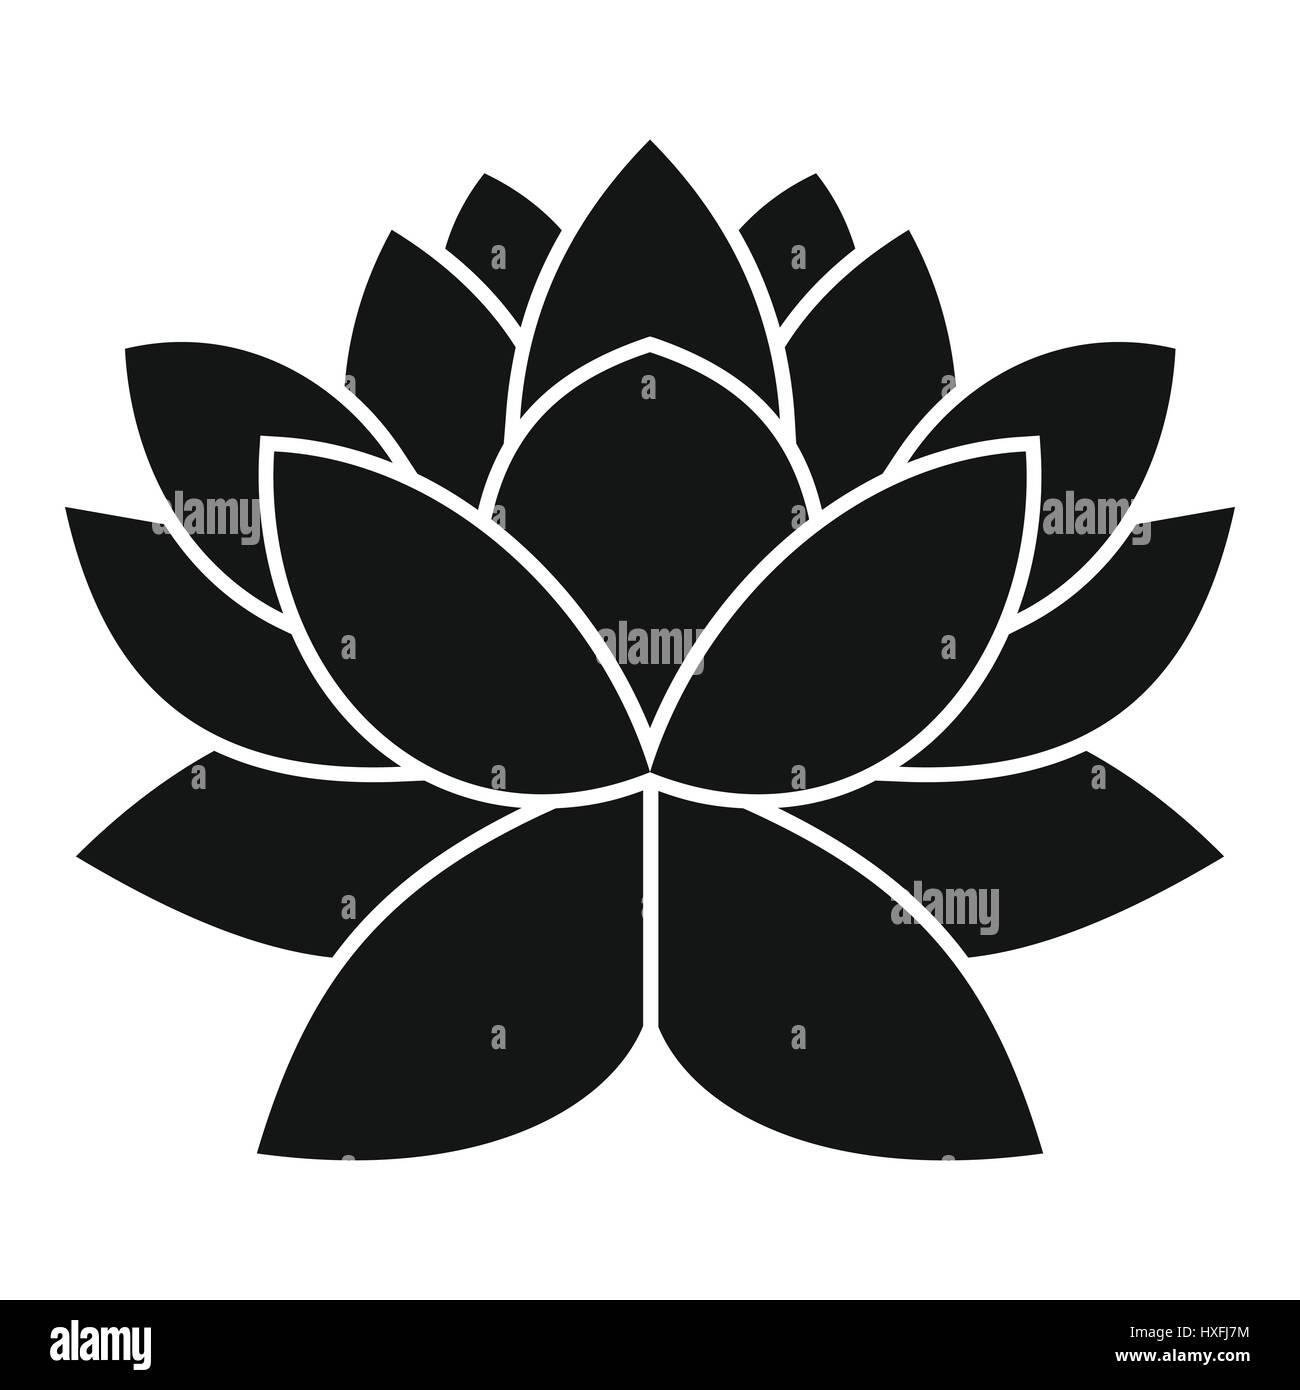 Lotus Flower Icon Simple Style Stock Vector Art Illustration